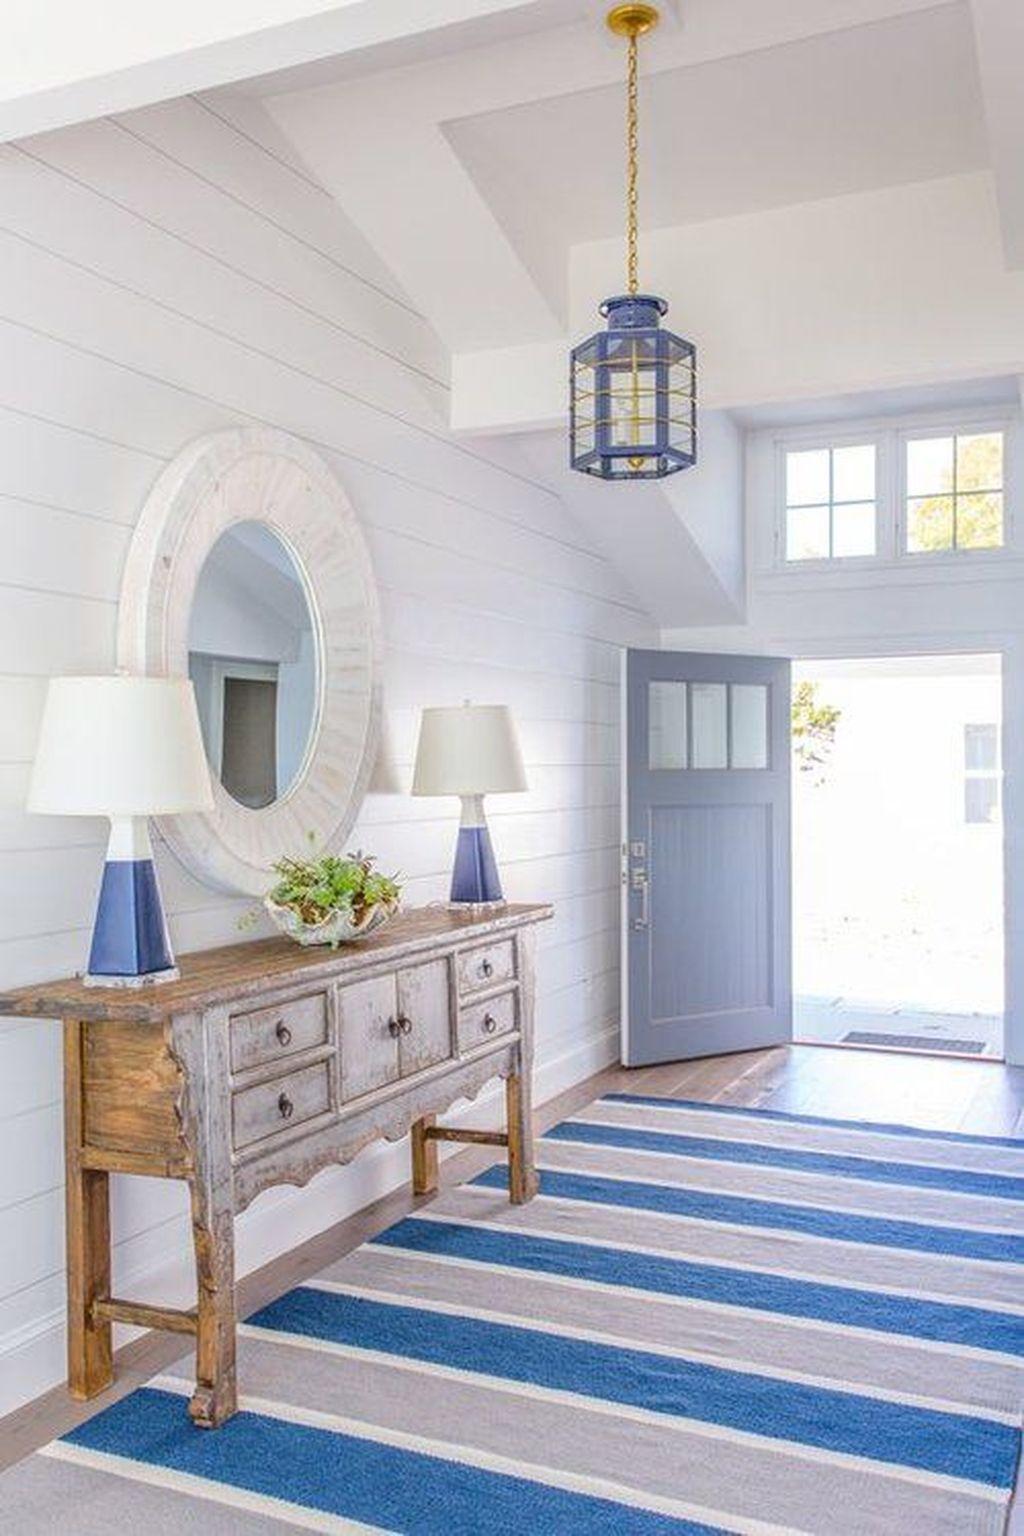 Admirable Beach House Decor Ideas You Should Copy 22